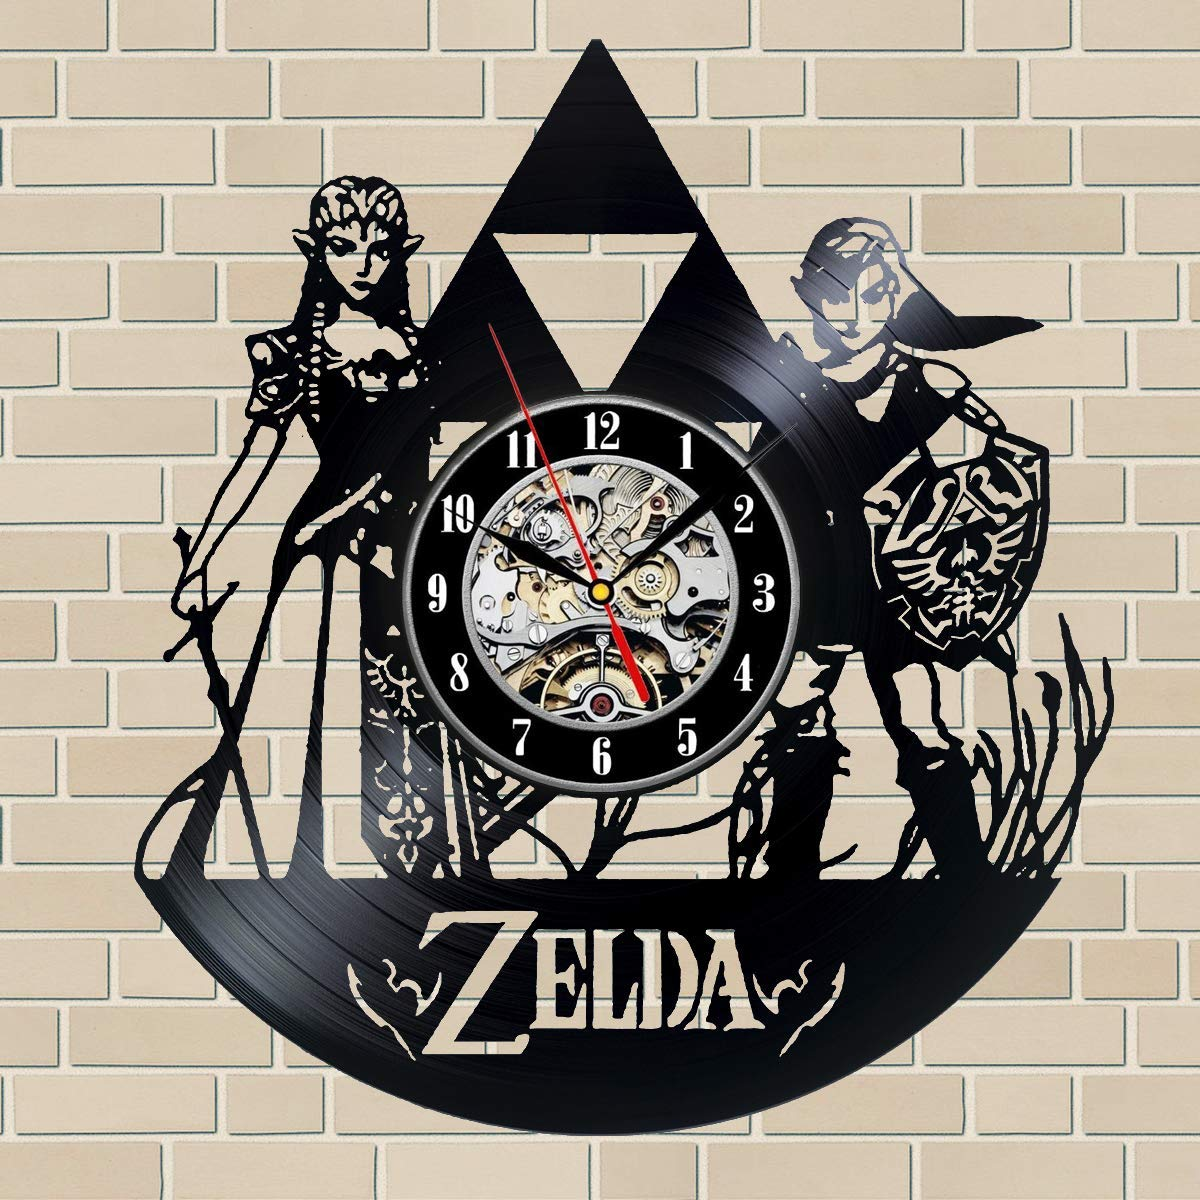 Amazon Com The Legend Of Zelda Wall Clock The Legend Of Zelda Vinyl Record Wall Clock The Legend Of Zelda Handmade Decor The Legend Of Zelda Wall Art The Legend Of Zelda Home